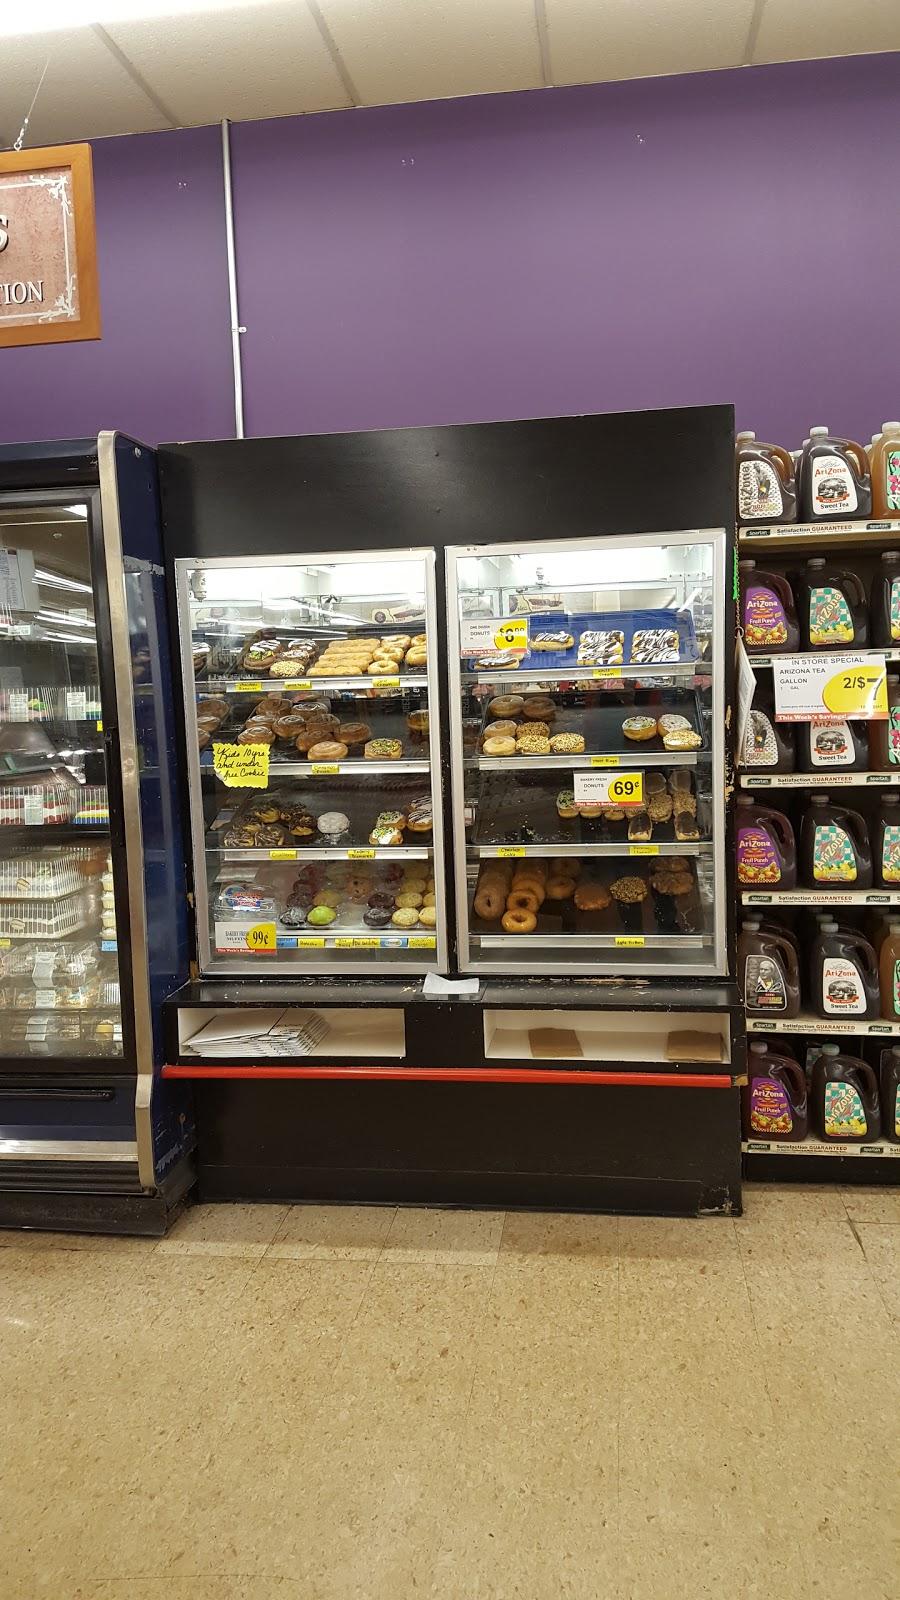 Vinckier Foods   store   5275 Lapeer Rd, Kimball, MI 48074, USA   8109879930 OR +1 810-987-9930